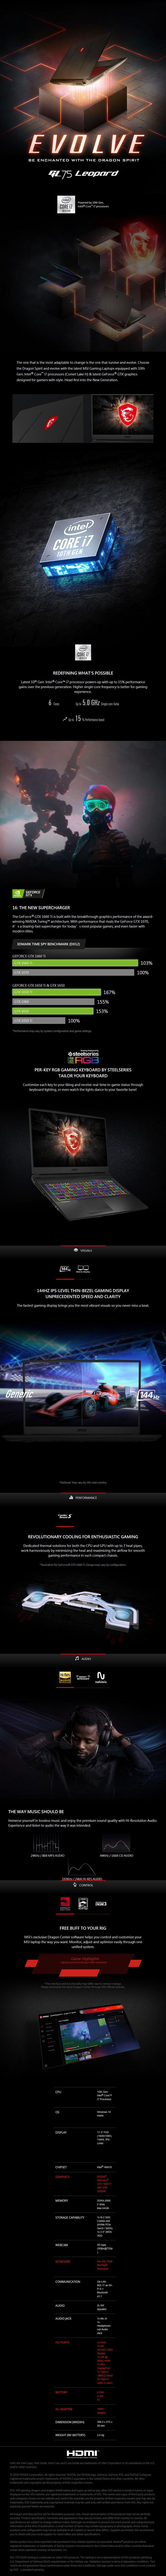 "MSI GL75 Leopard 10SDK 17.3"" 144HZ Gaming Laptop i7 16GB 512GB GTX1660Ti W10P - Overview 1"